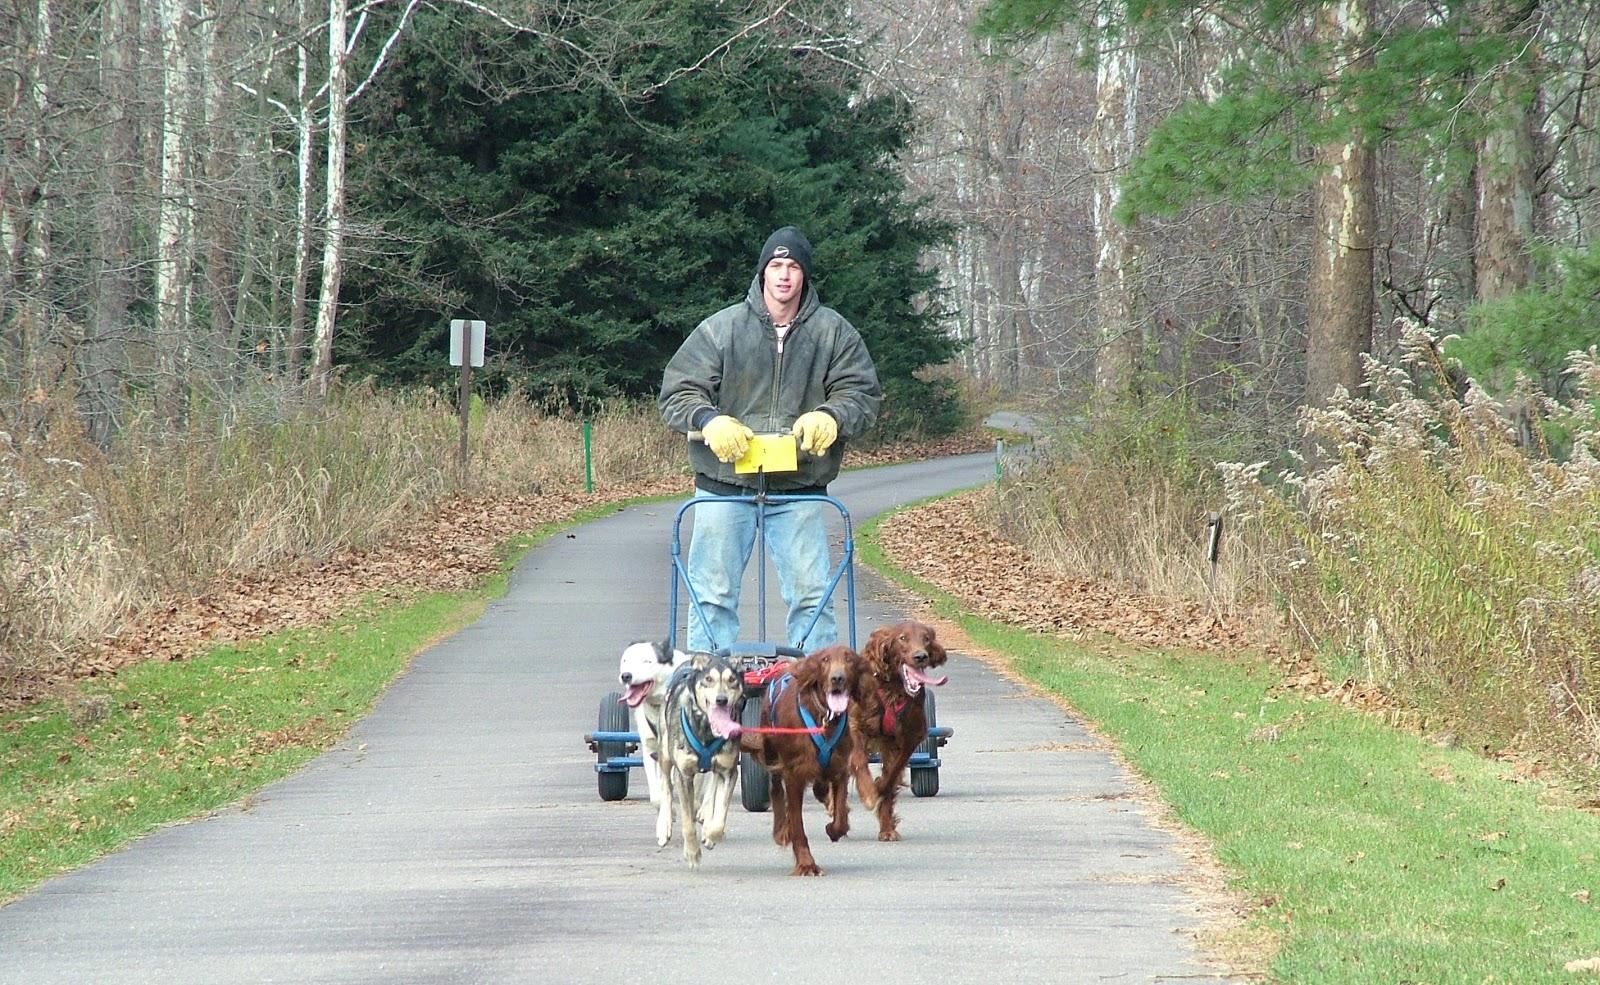 Cameron County Pa News Sled Dog Races At Sinnemahoning